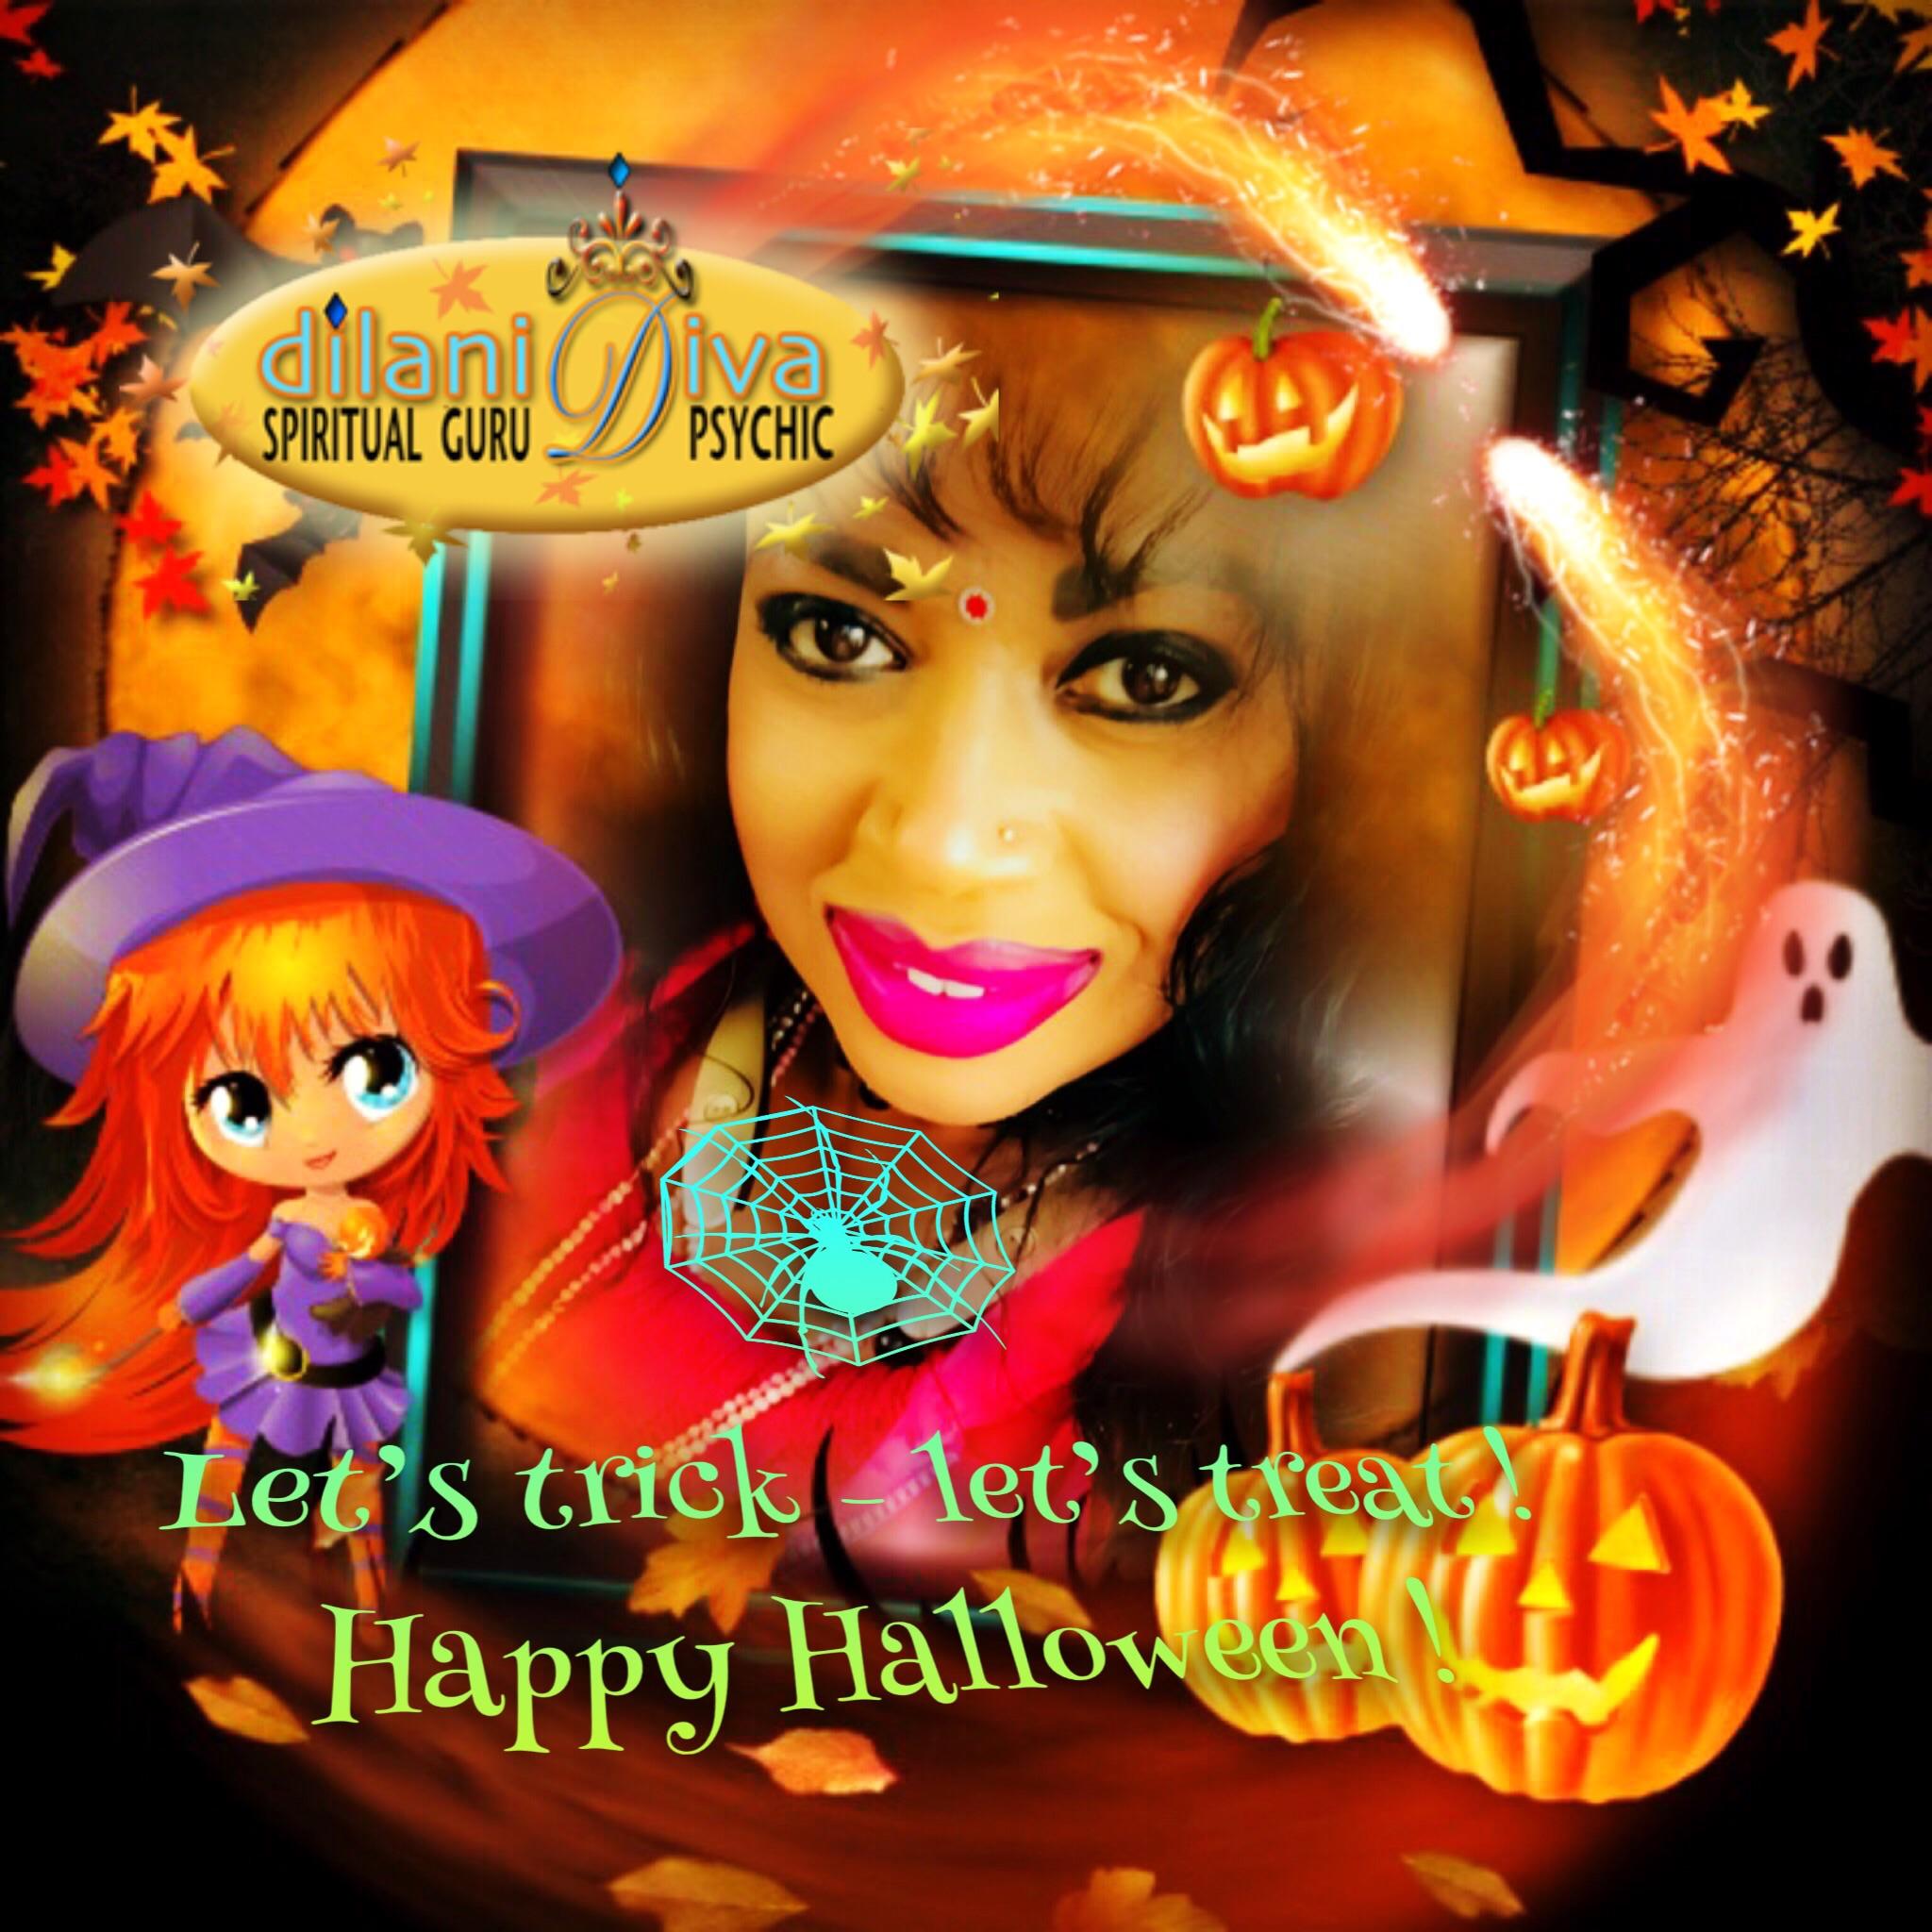 Happy Halloween, Dilani Diva